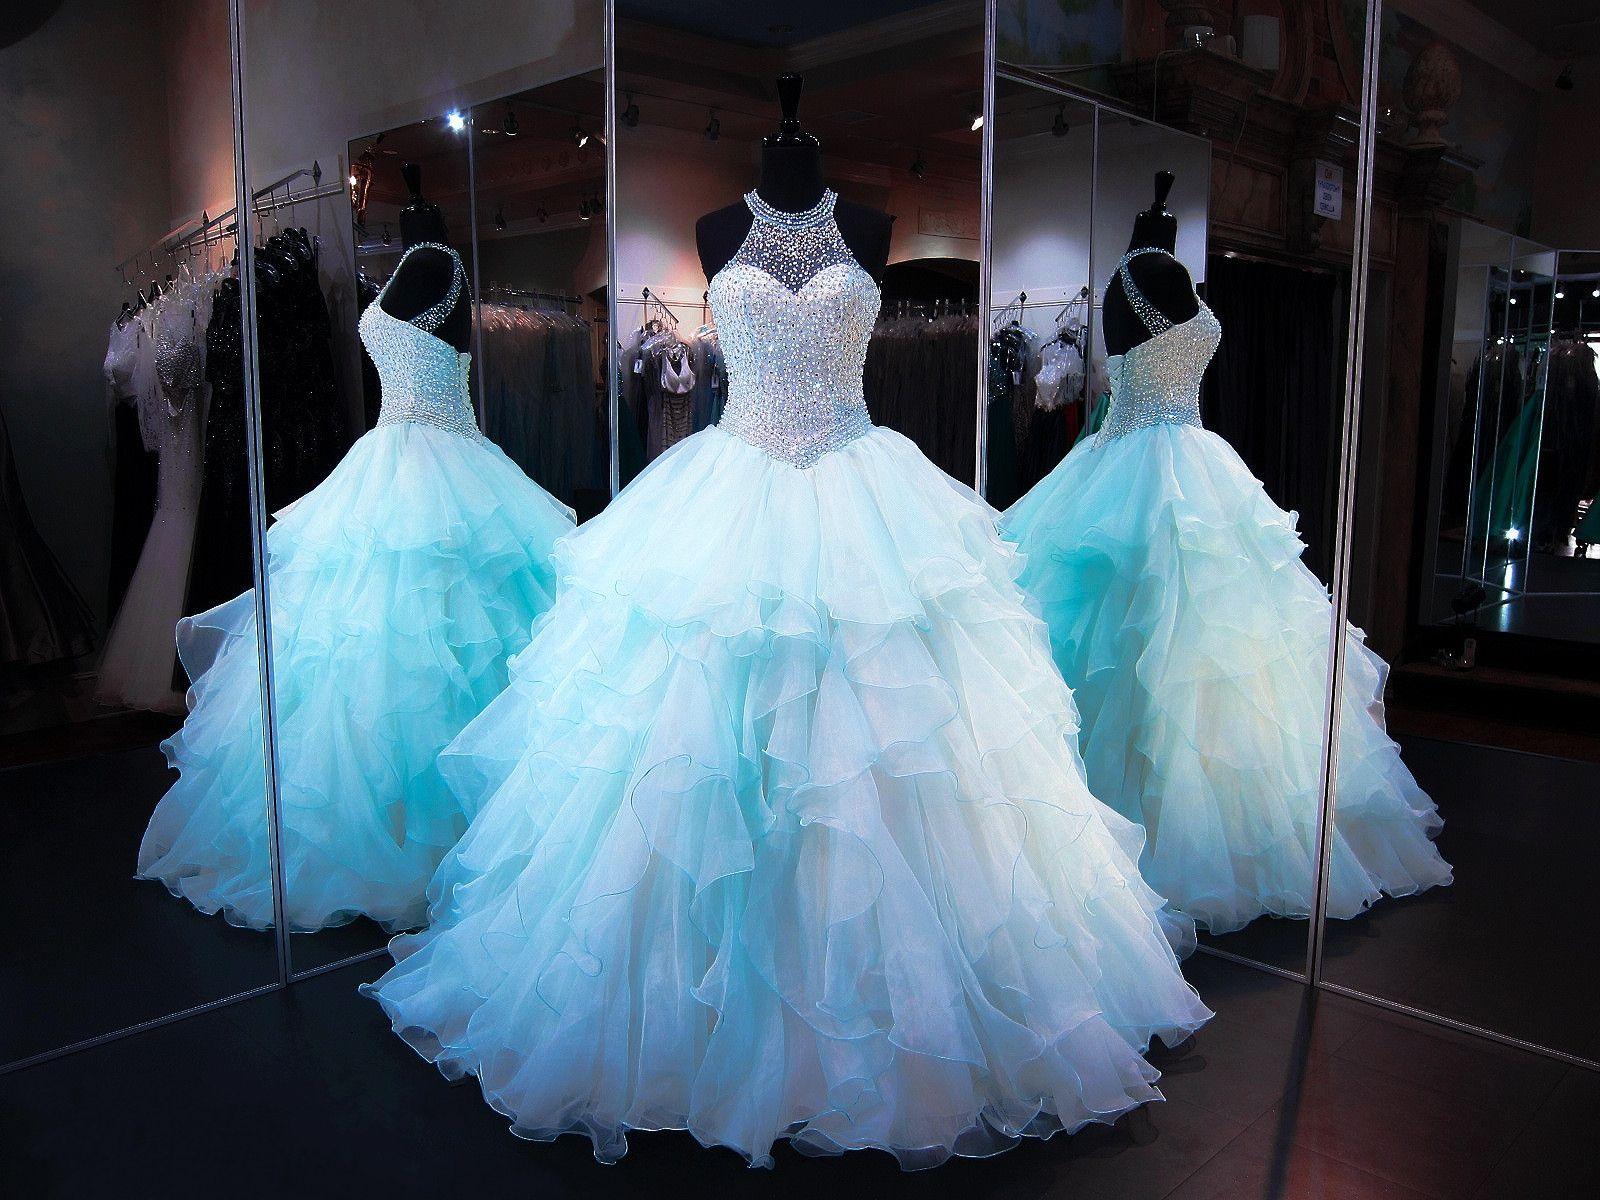 Fine Gothic Corset Wedding Dresses Photos - Wedding Ideas ...